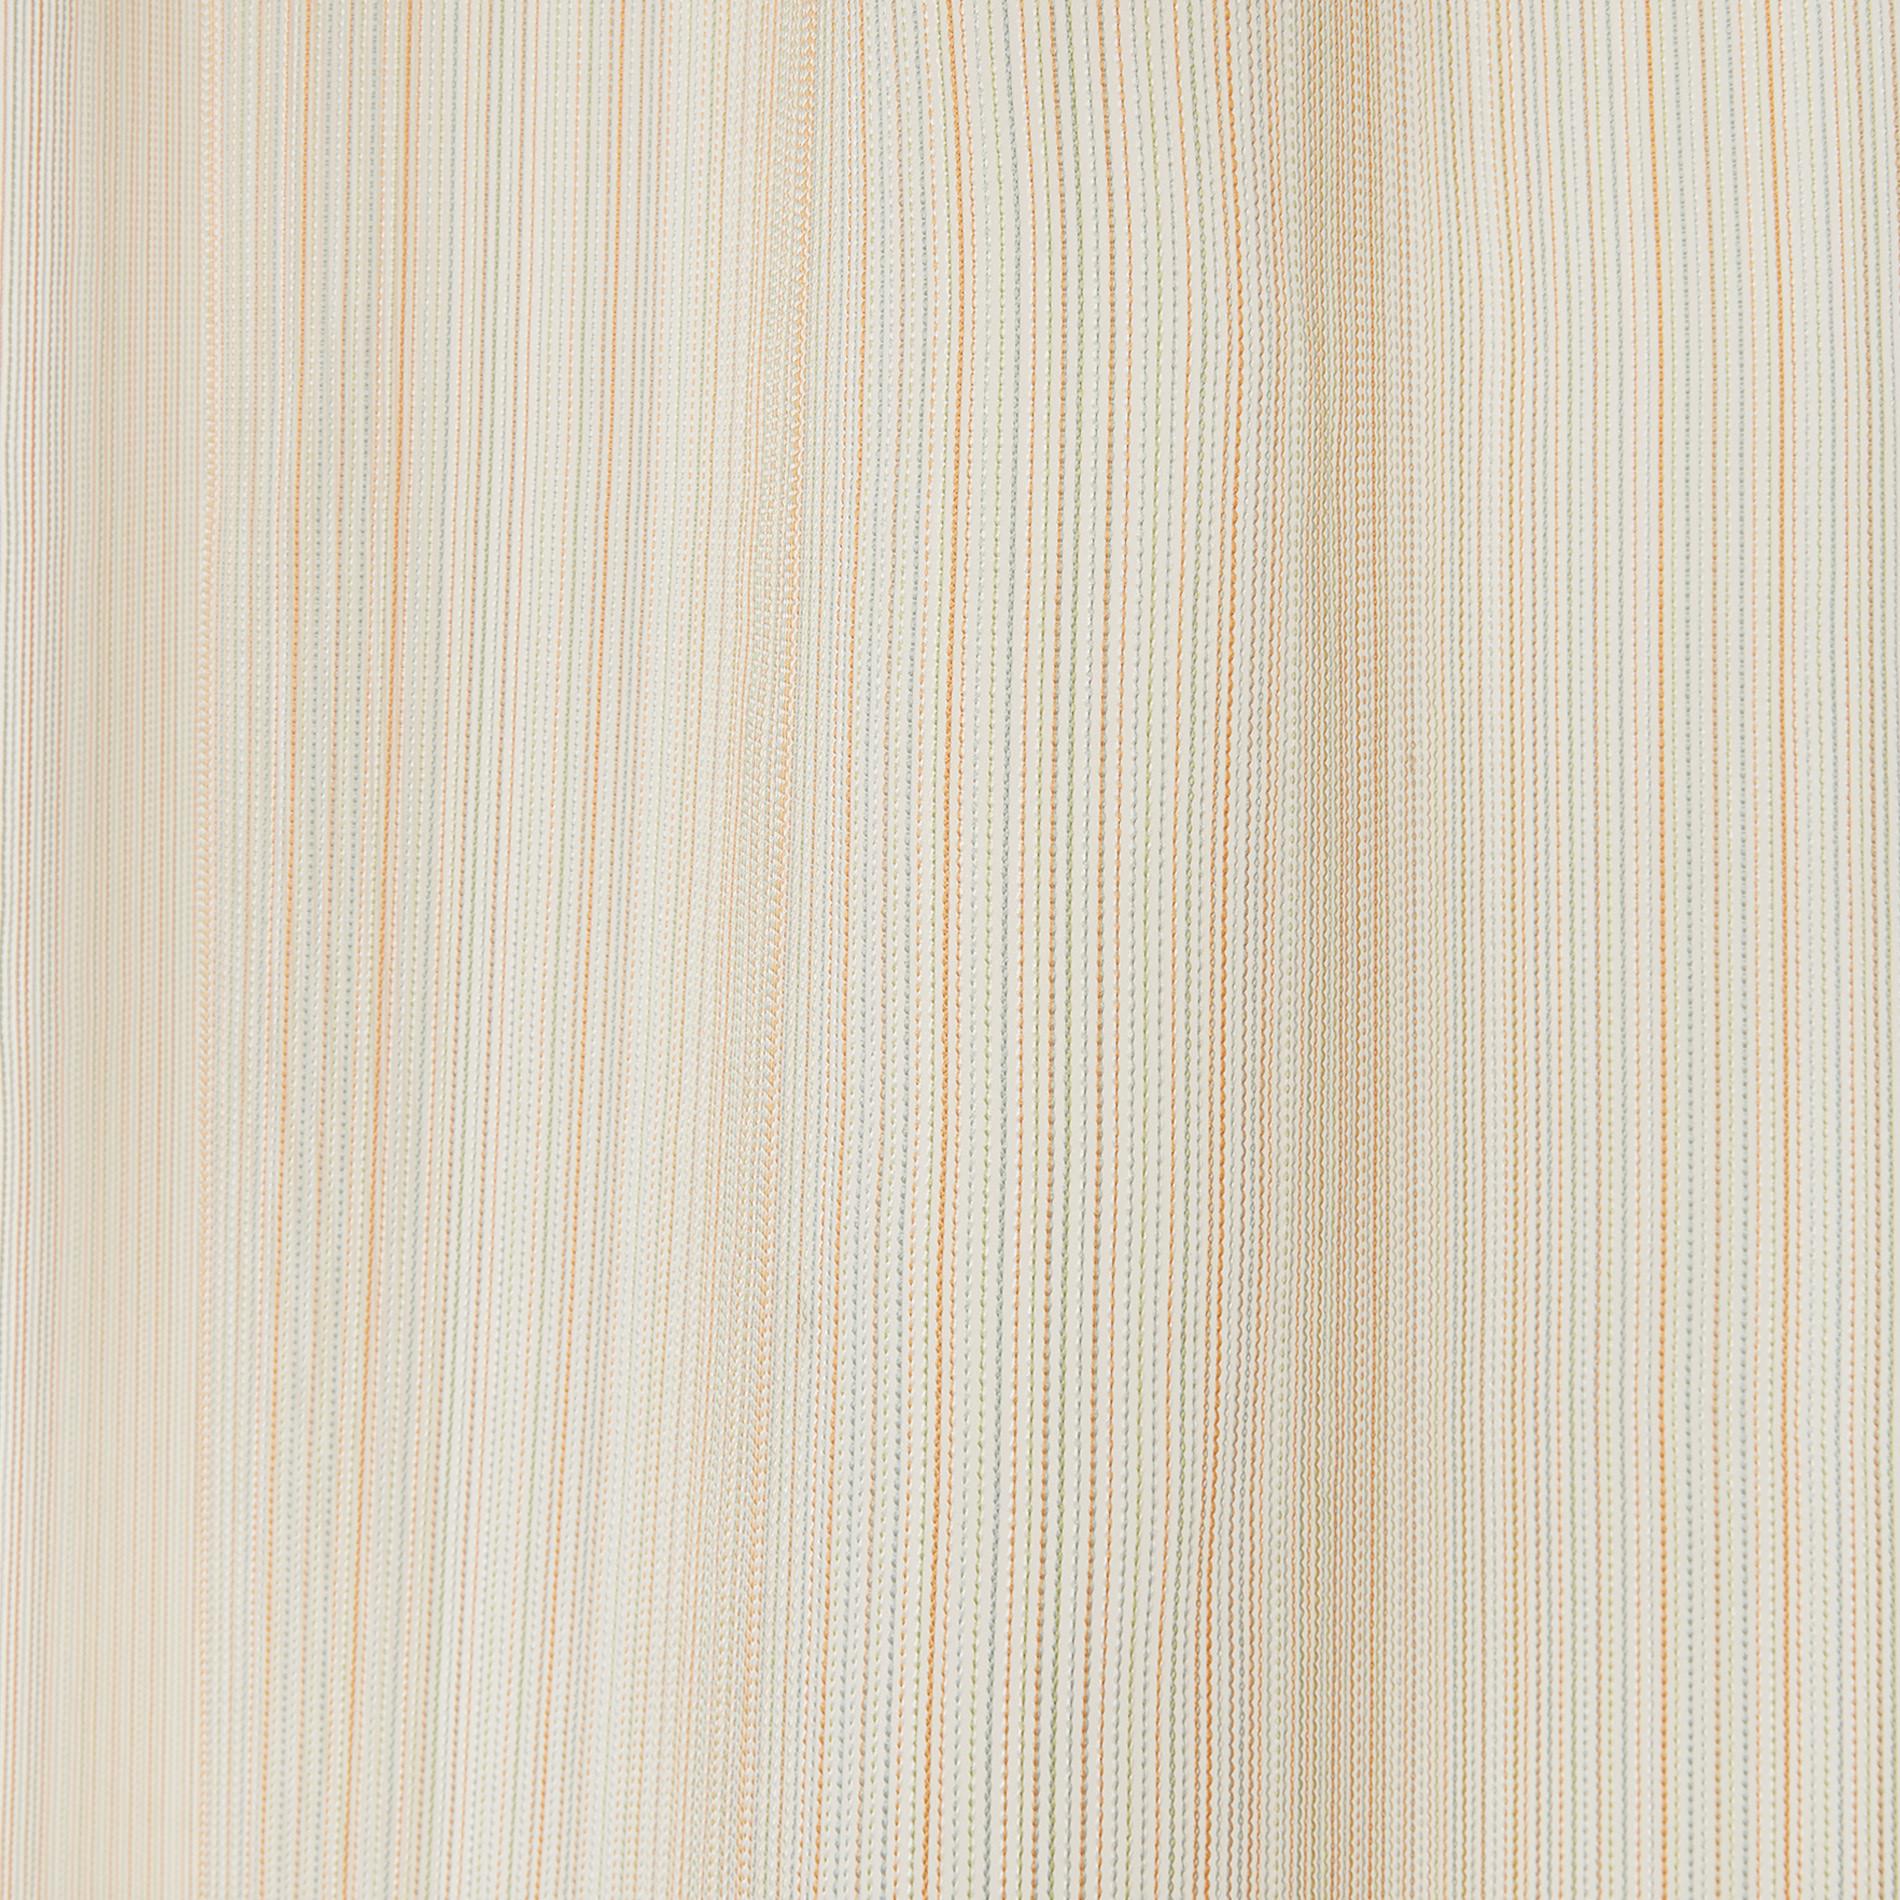 Tenda effetto righe passanti nascosti, Multicolor, large image number 0